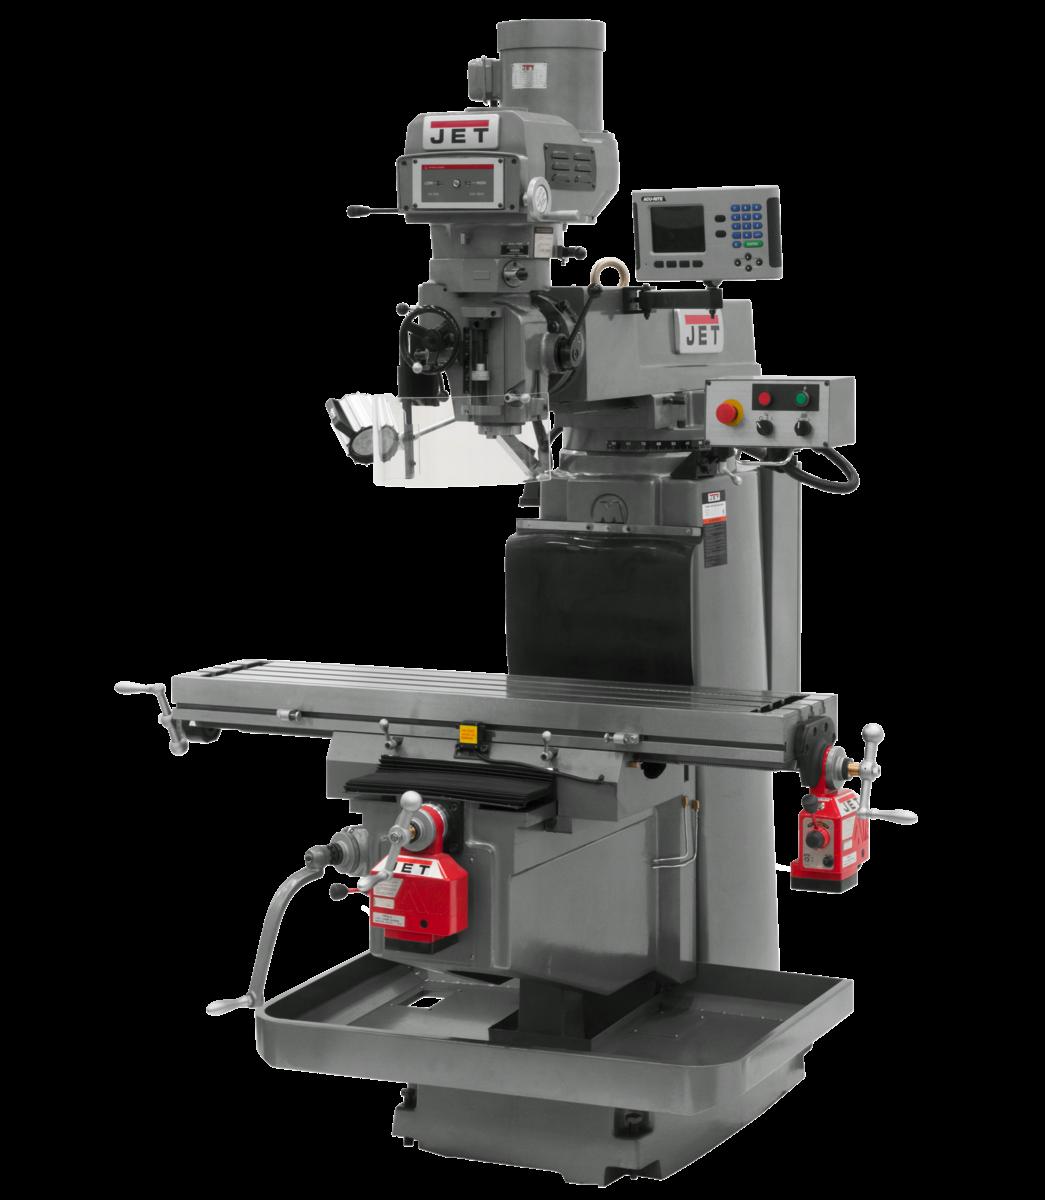 JTM-1254VS with  ACU-RITE  203 DRO X & Y Powerfeeds